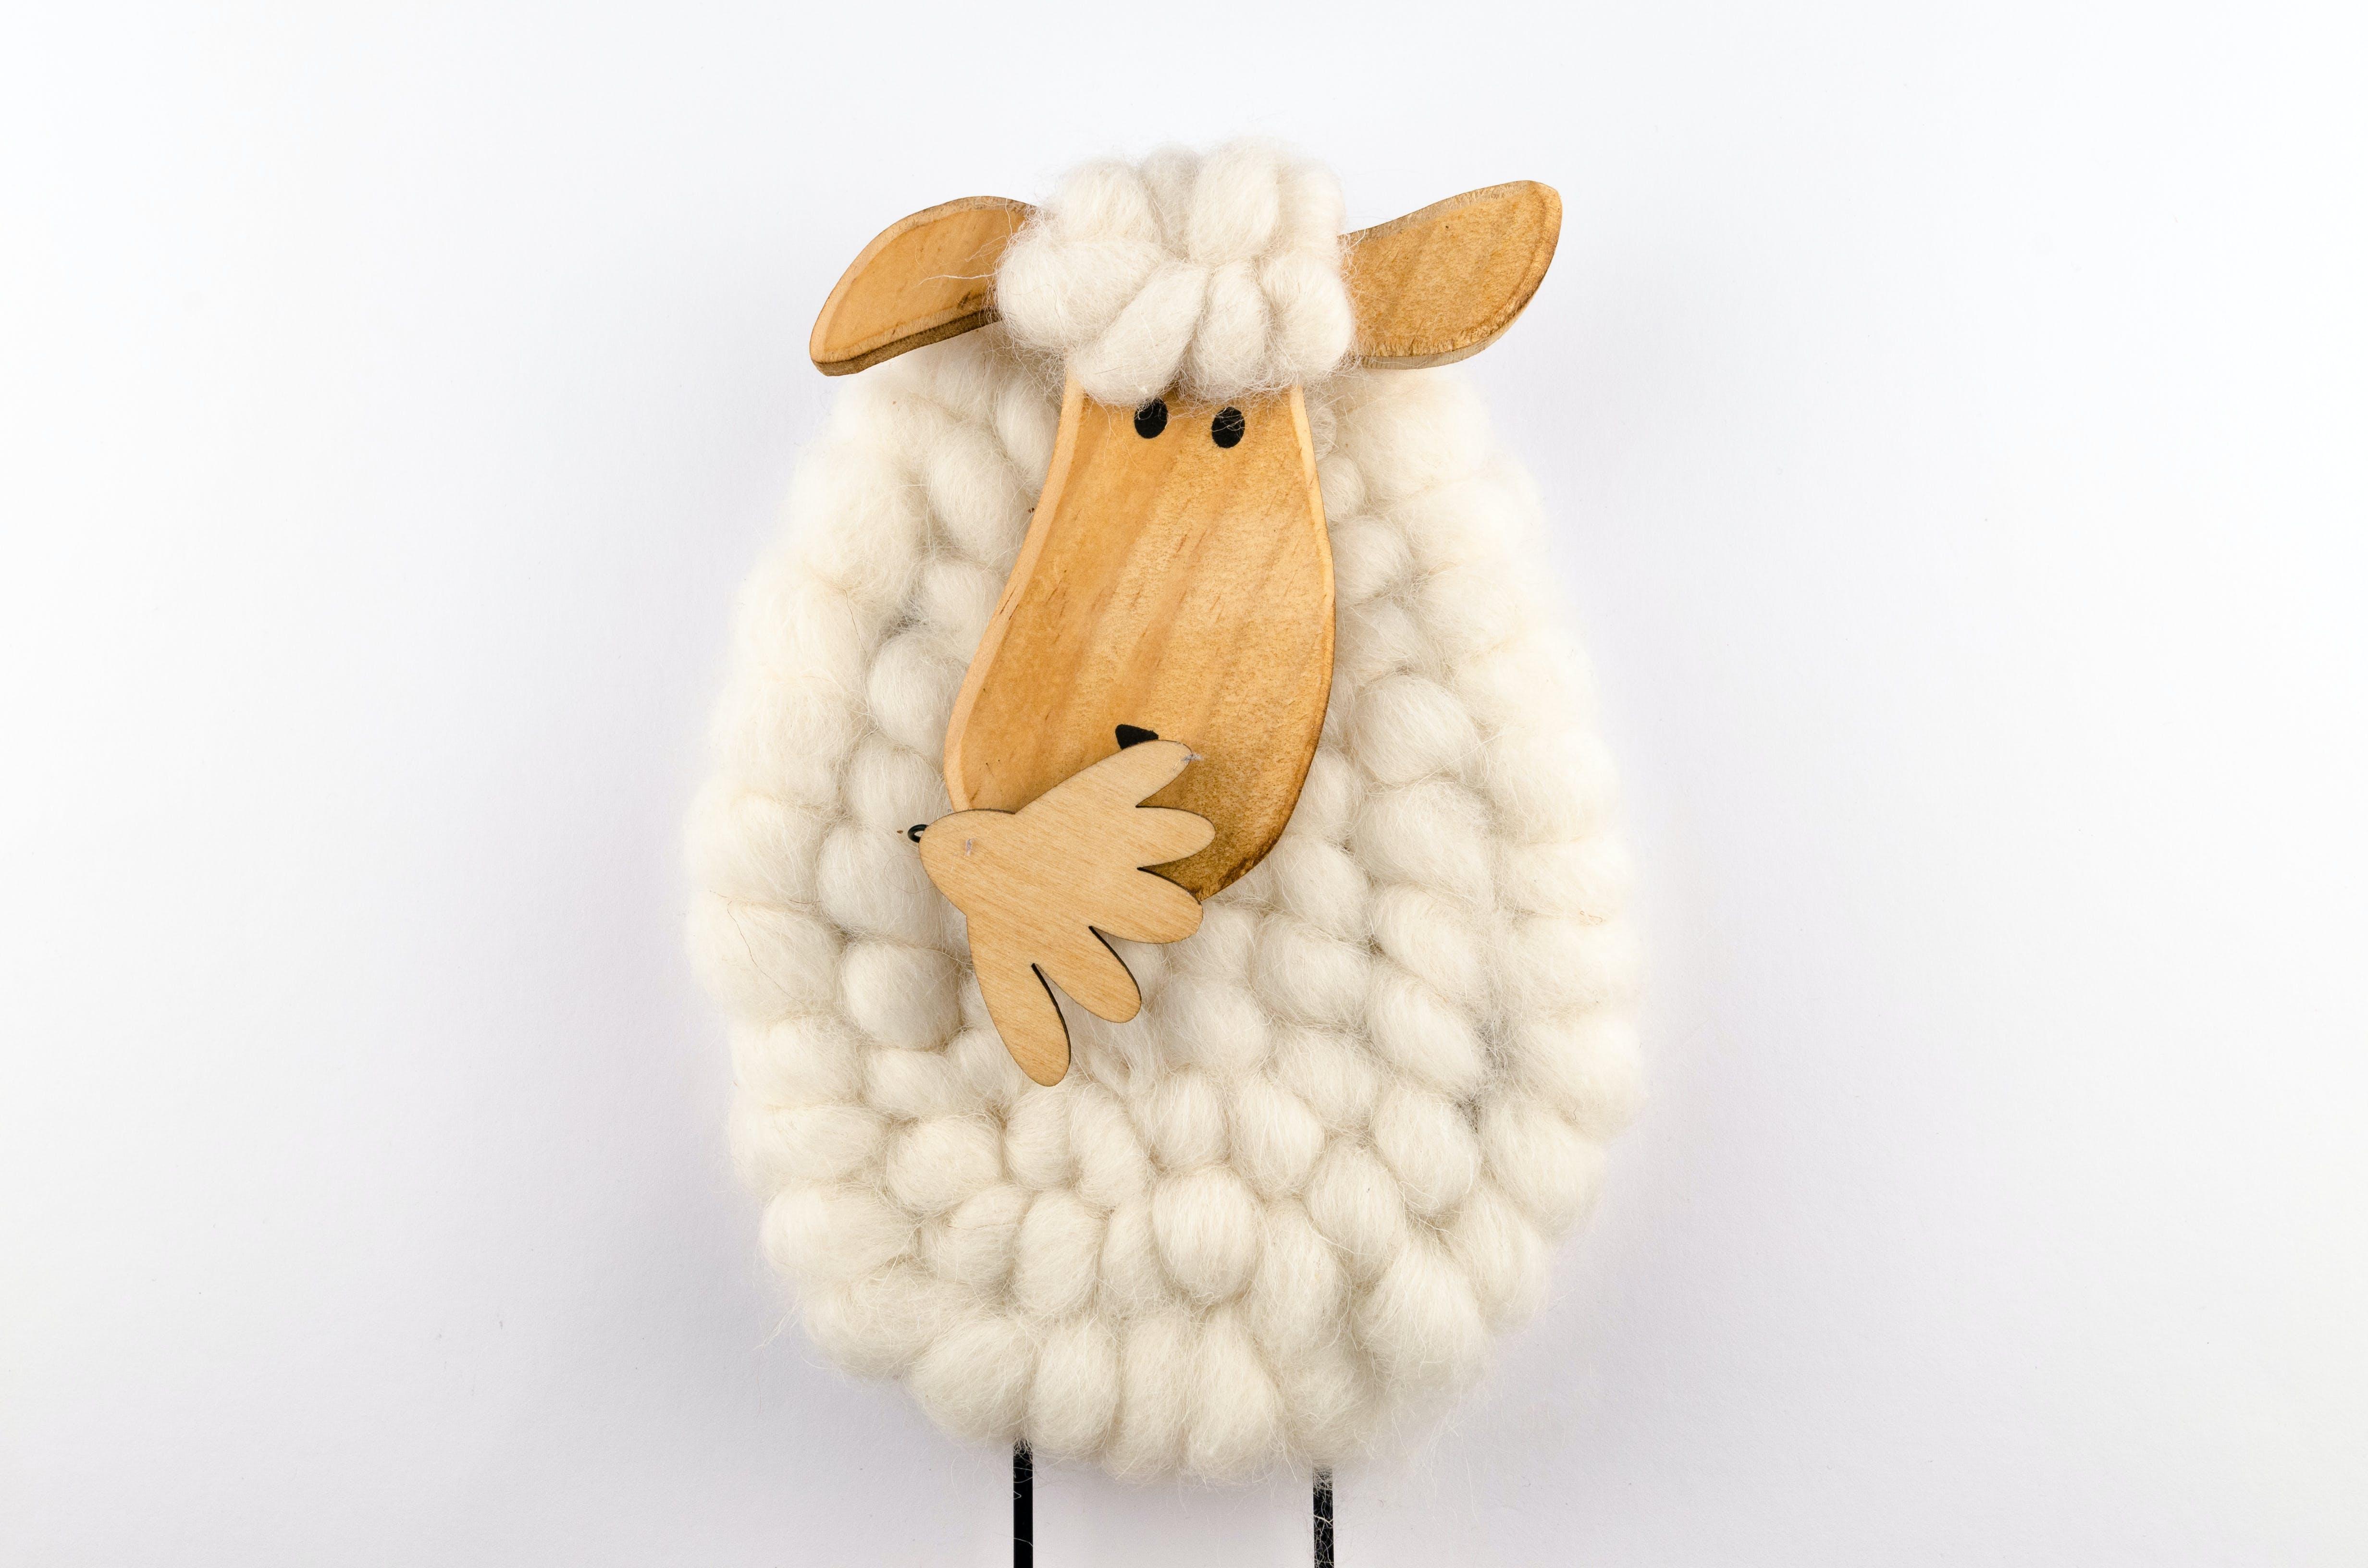 Fotos de stock gratuitas de contradecir, juguete, mono, oveja